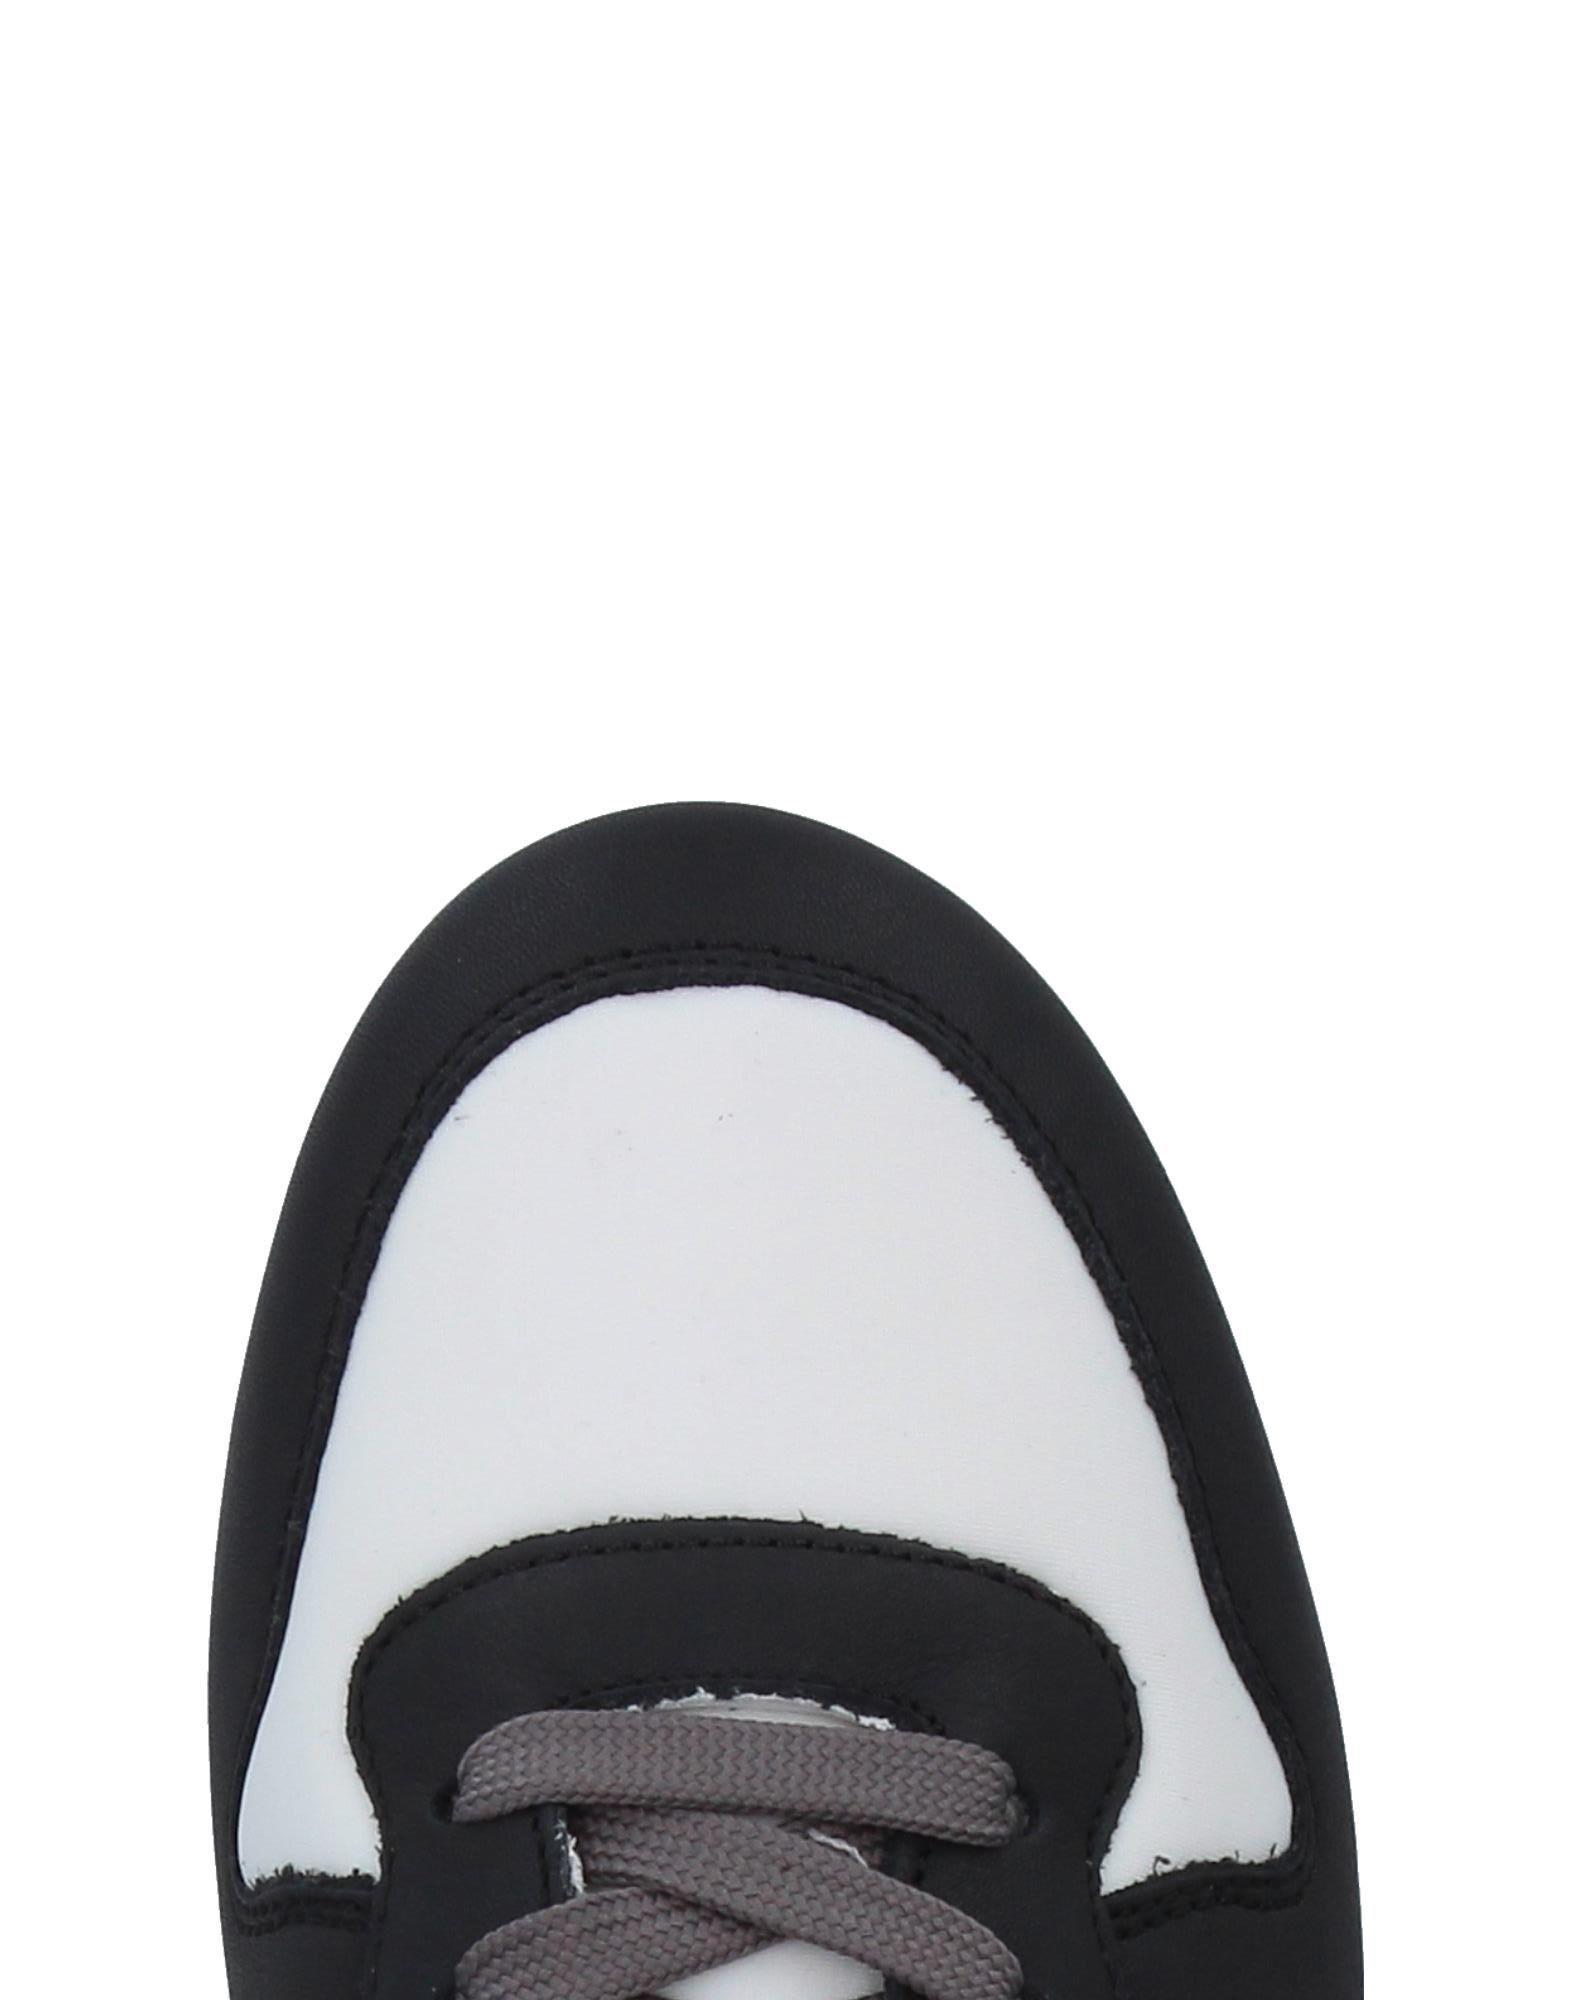 Hogan Sneakers Herren beliebte  11396907MT Gute Qualität beliebte Herren Schuhe 88d4a2